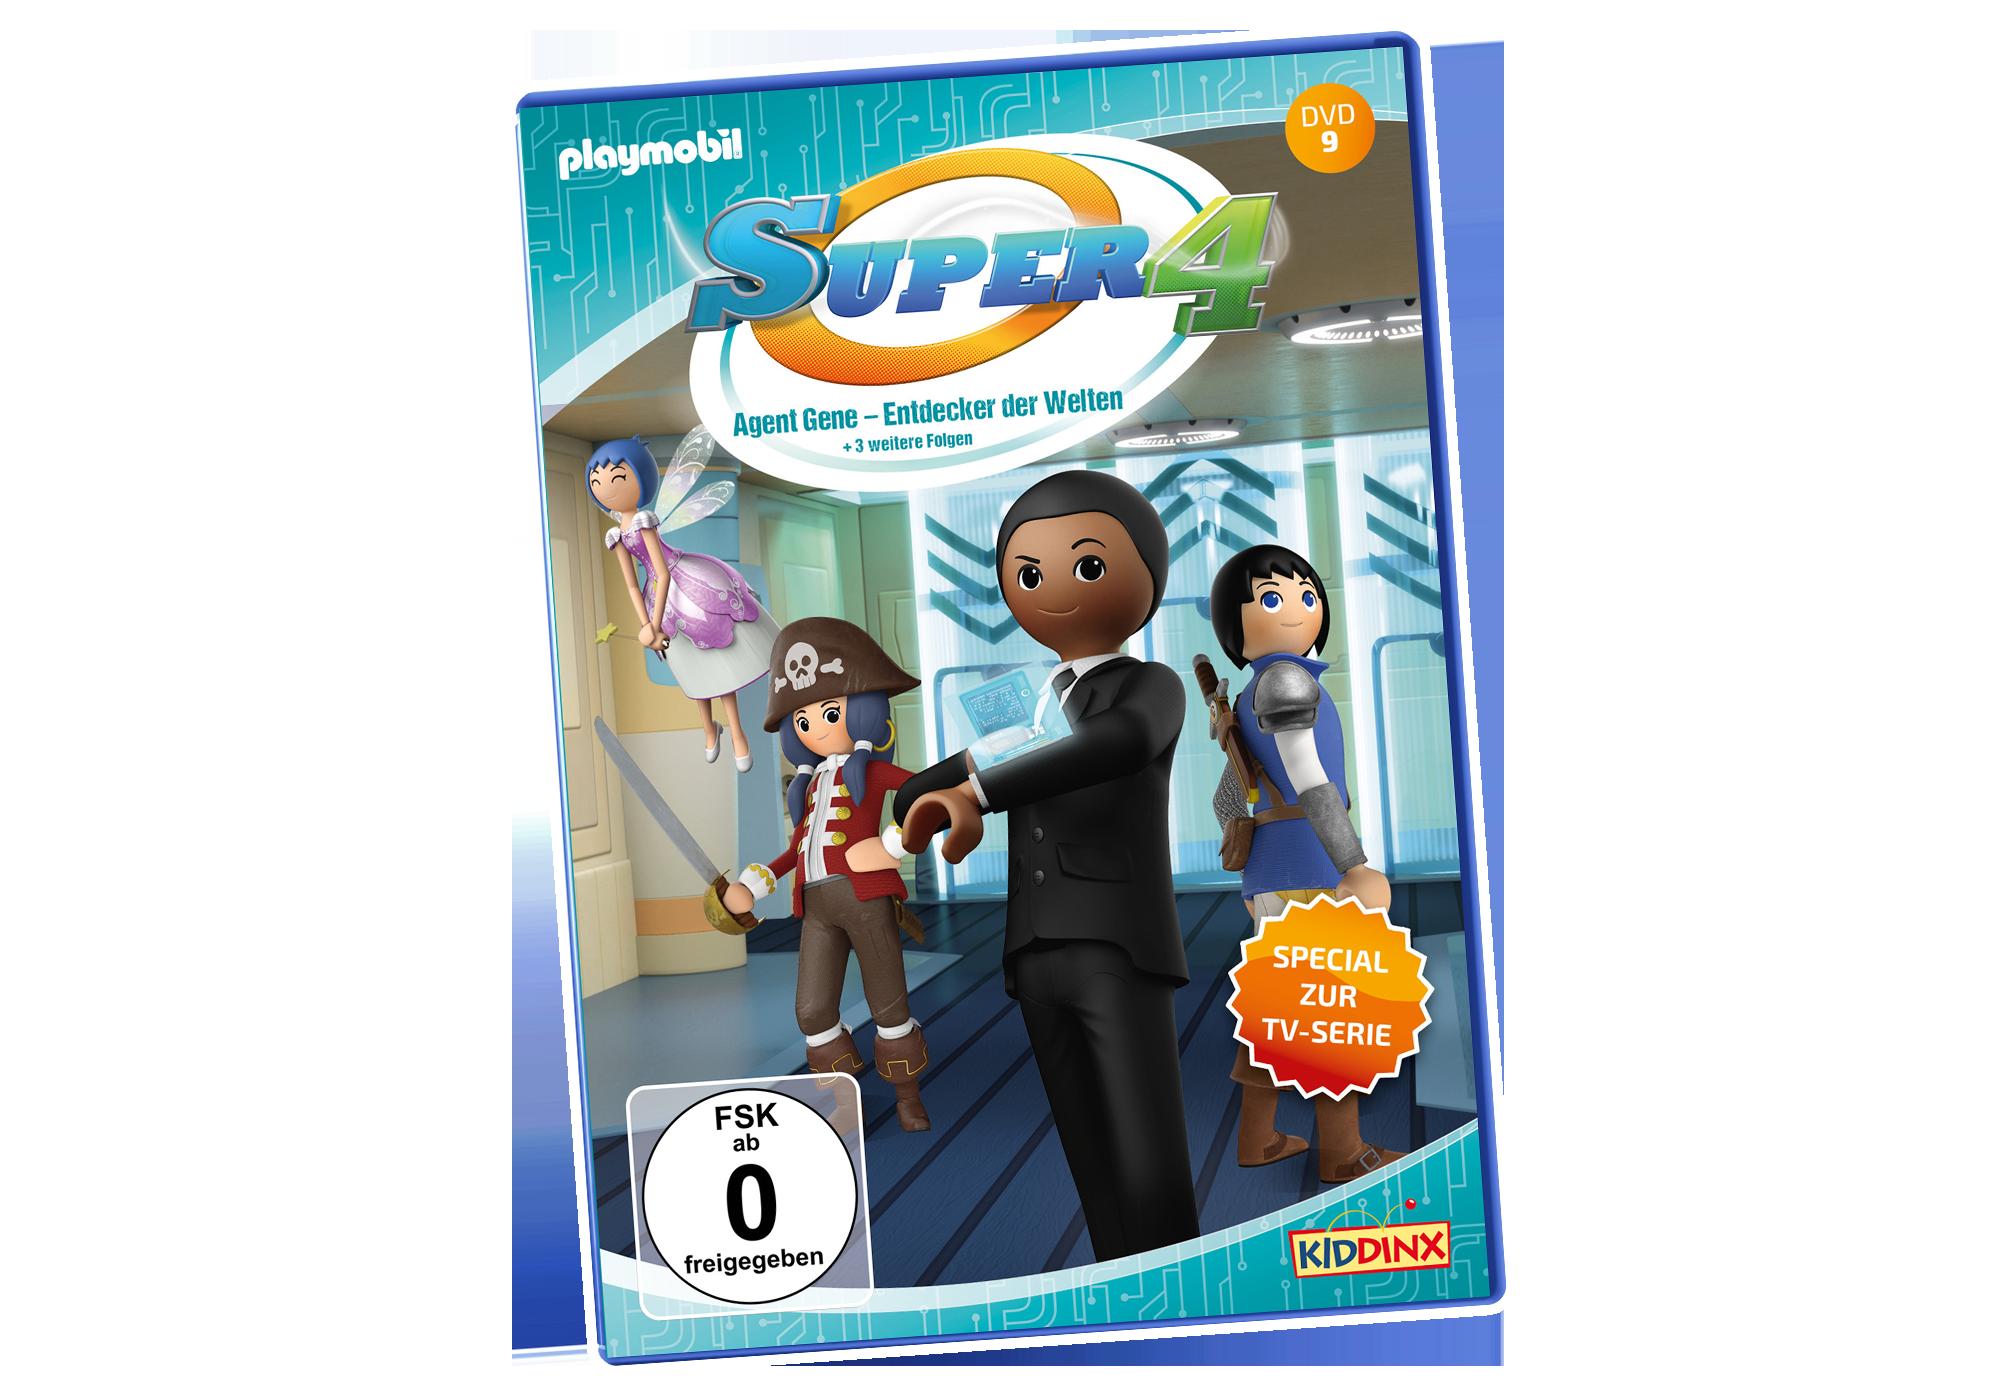 http://media.playmobil.com/i/playmobil/80021_product_detail/DVD Super4: Agent Gene, Entdecker der Welten